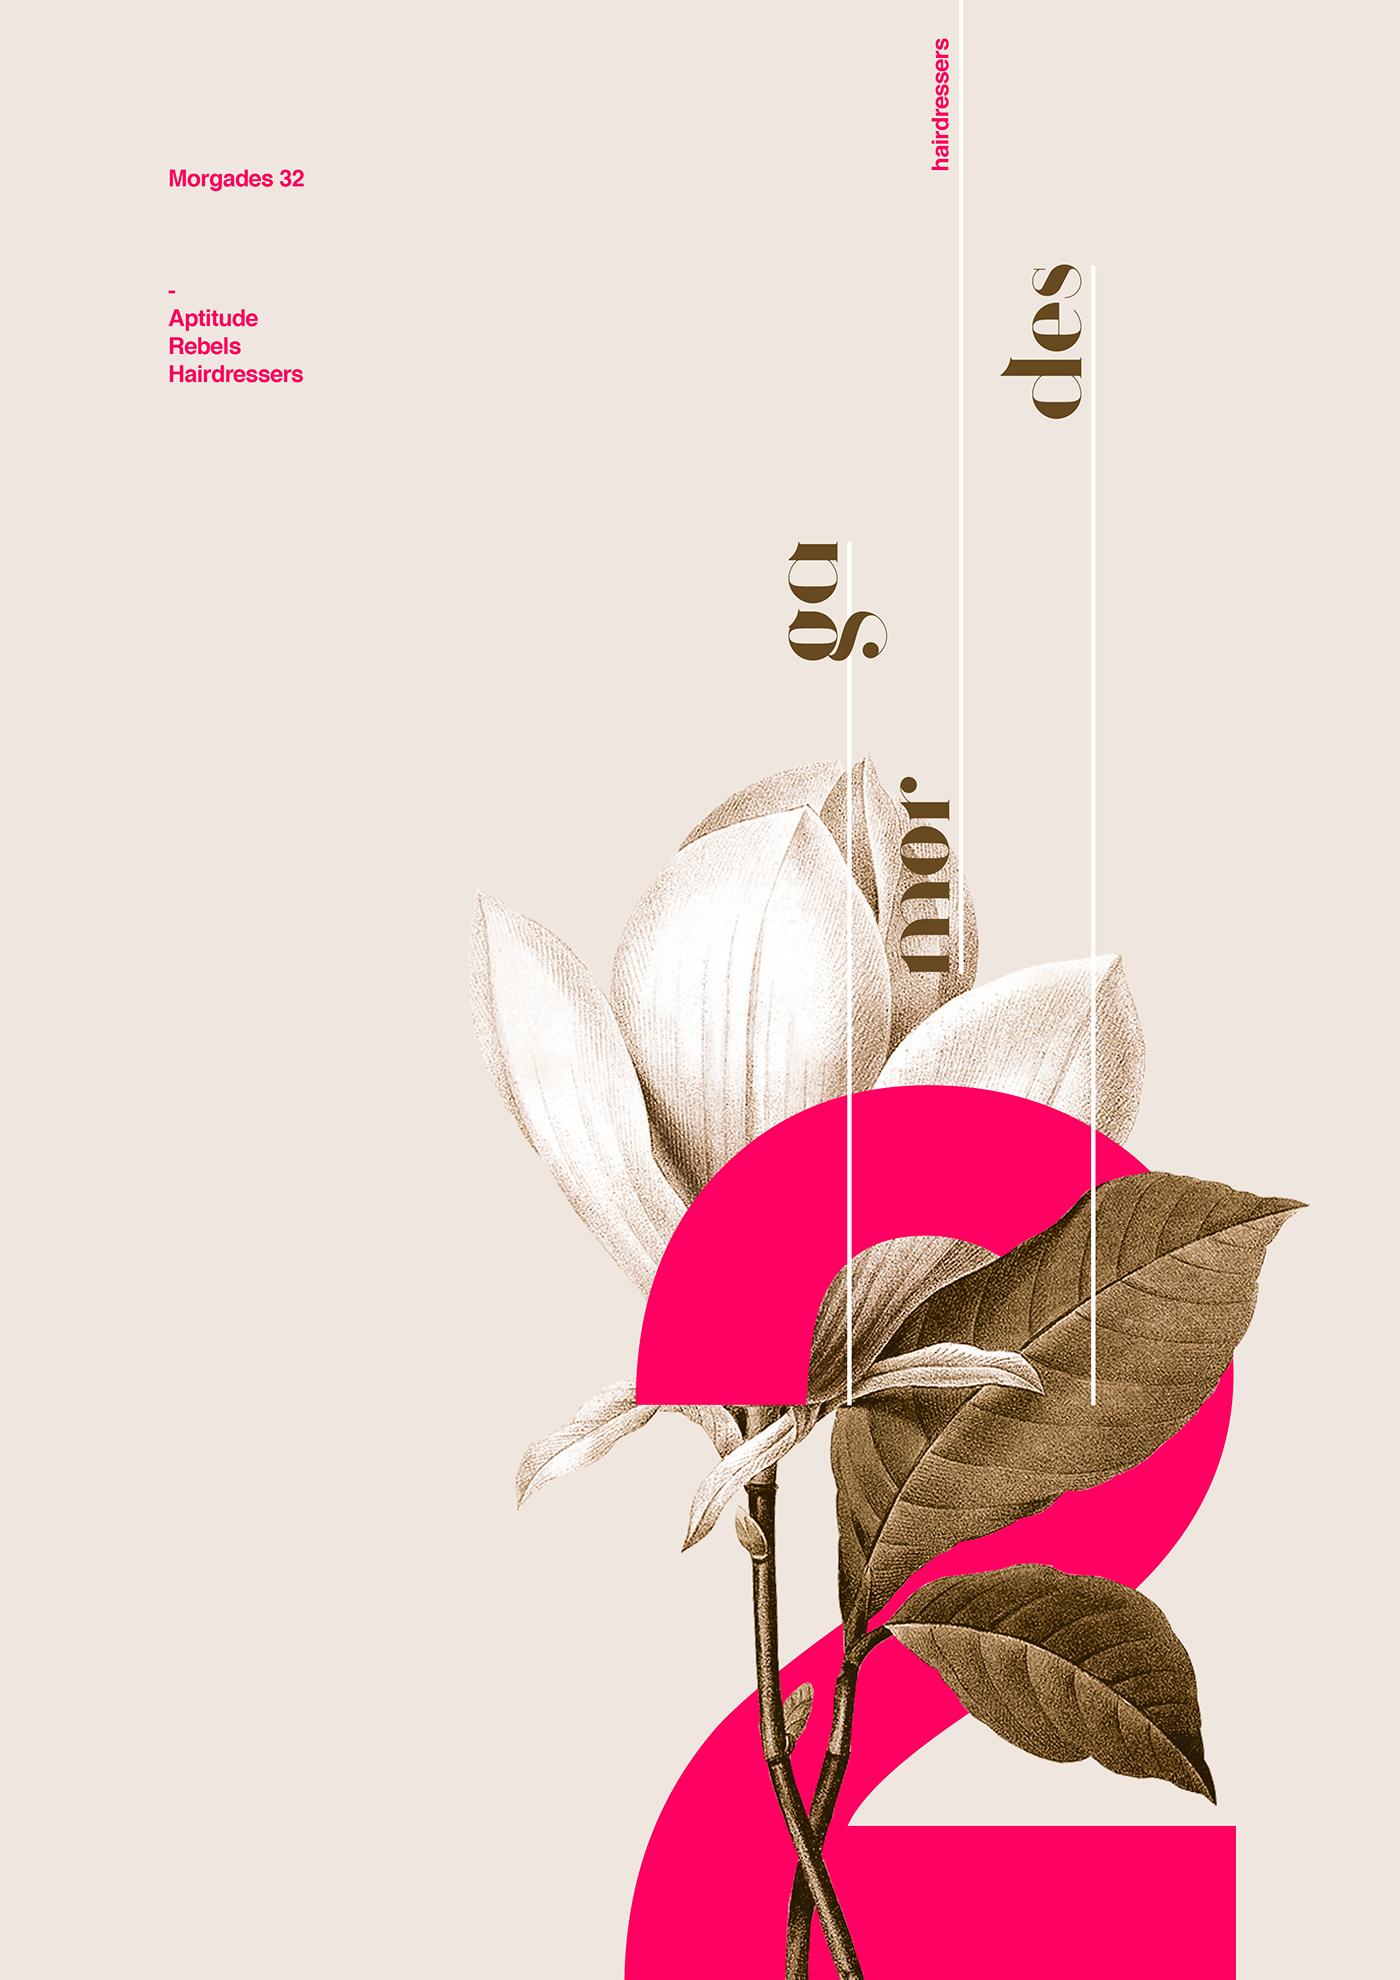 Xavier Esclusa Behance poster type minimal hairdressers flower spring design Typographie plants m32